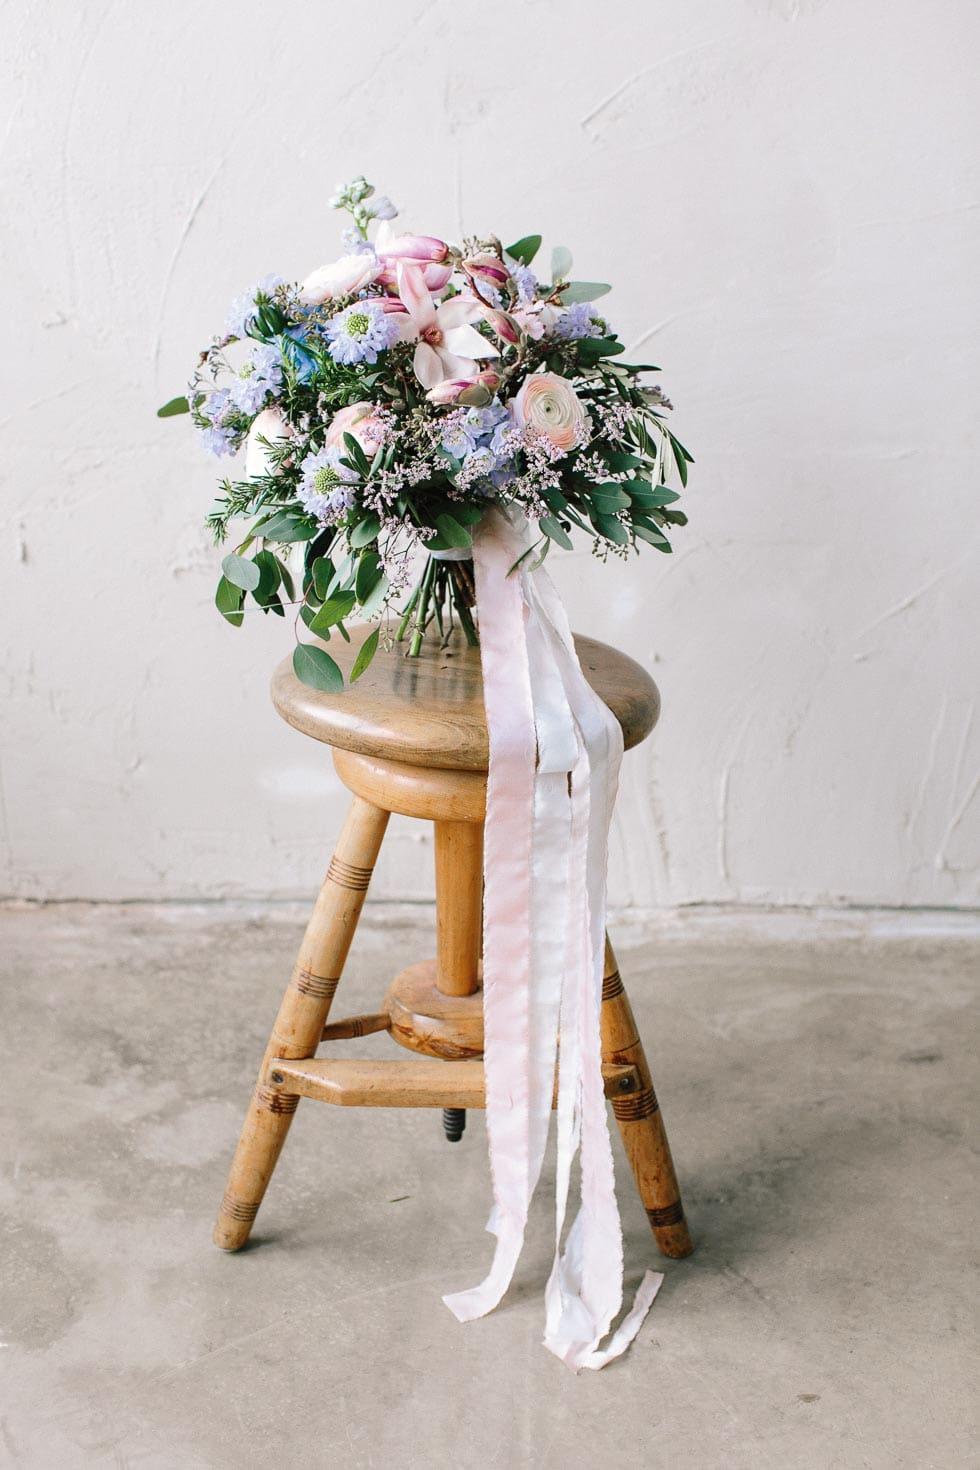 Brautstrauß Lila, Blau und Rosa